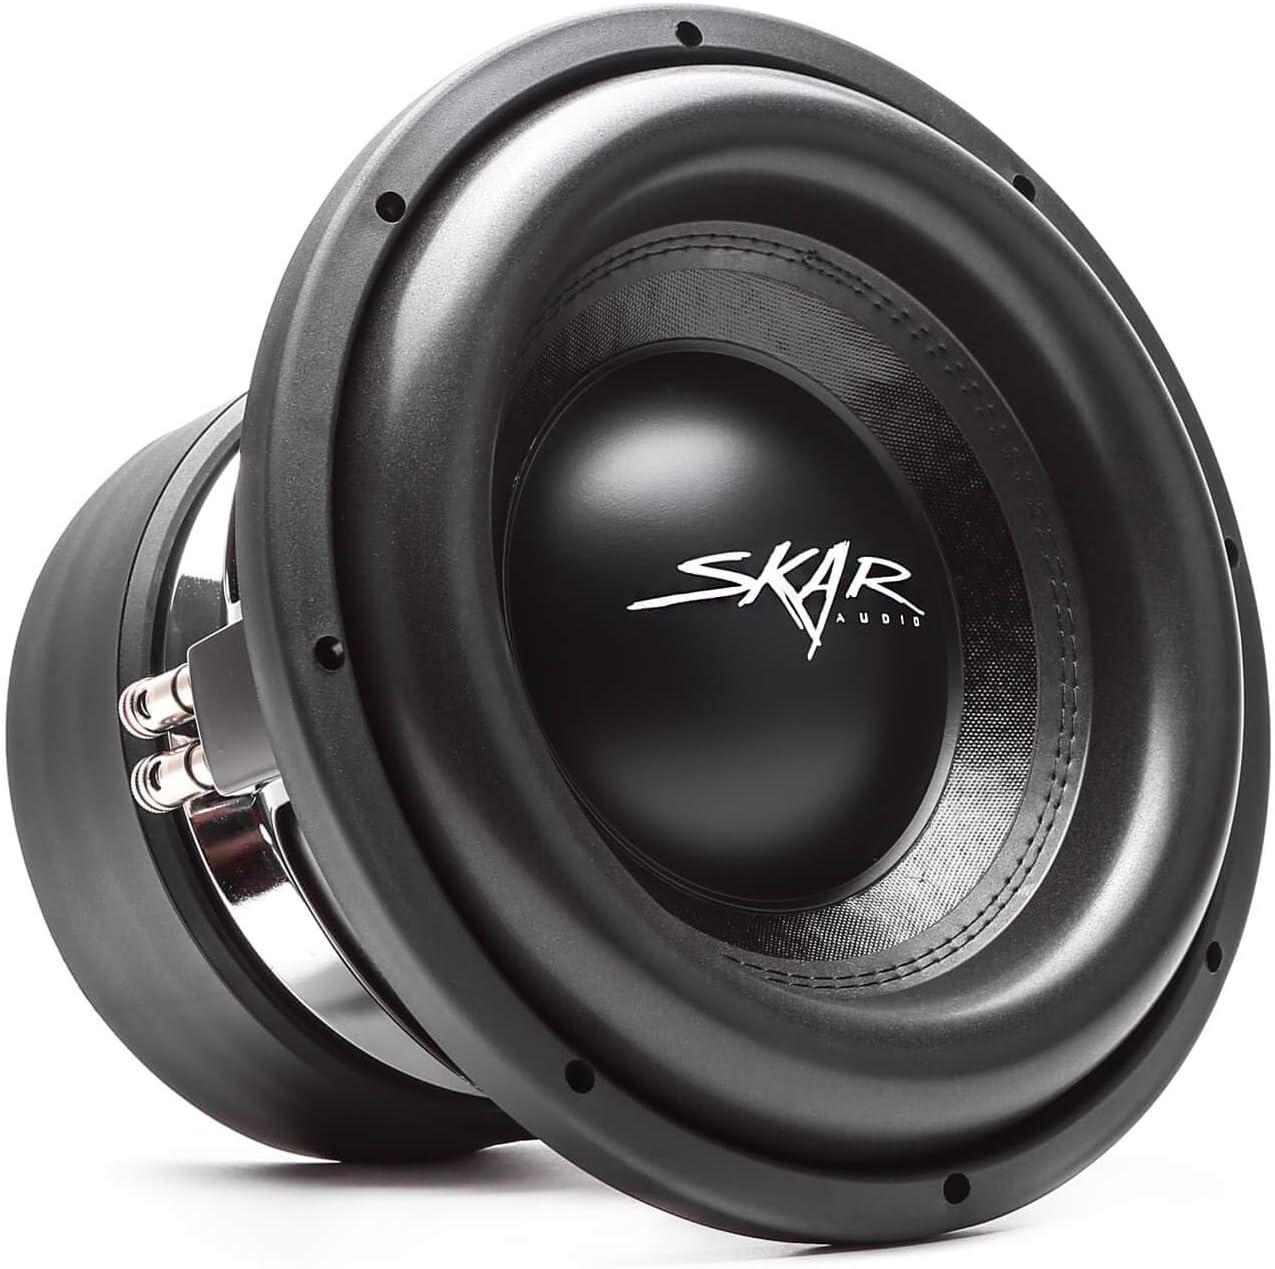 Skar Audio VXF-12 D2 12 3000 Watt Max Power Dual 2 Ohm Competition Car Subwoofer